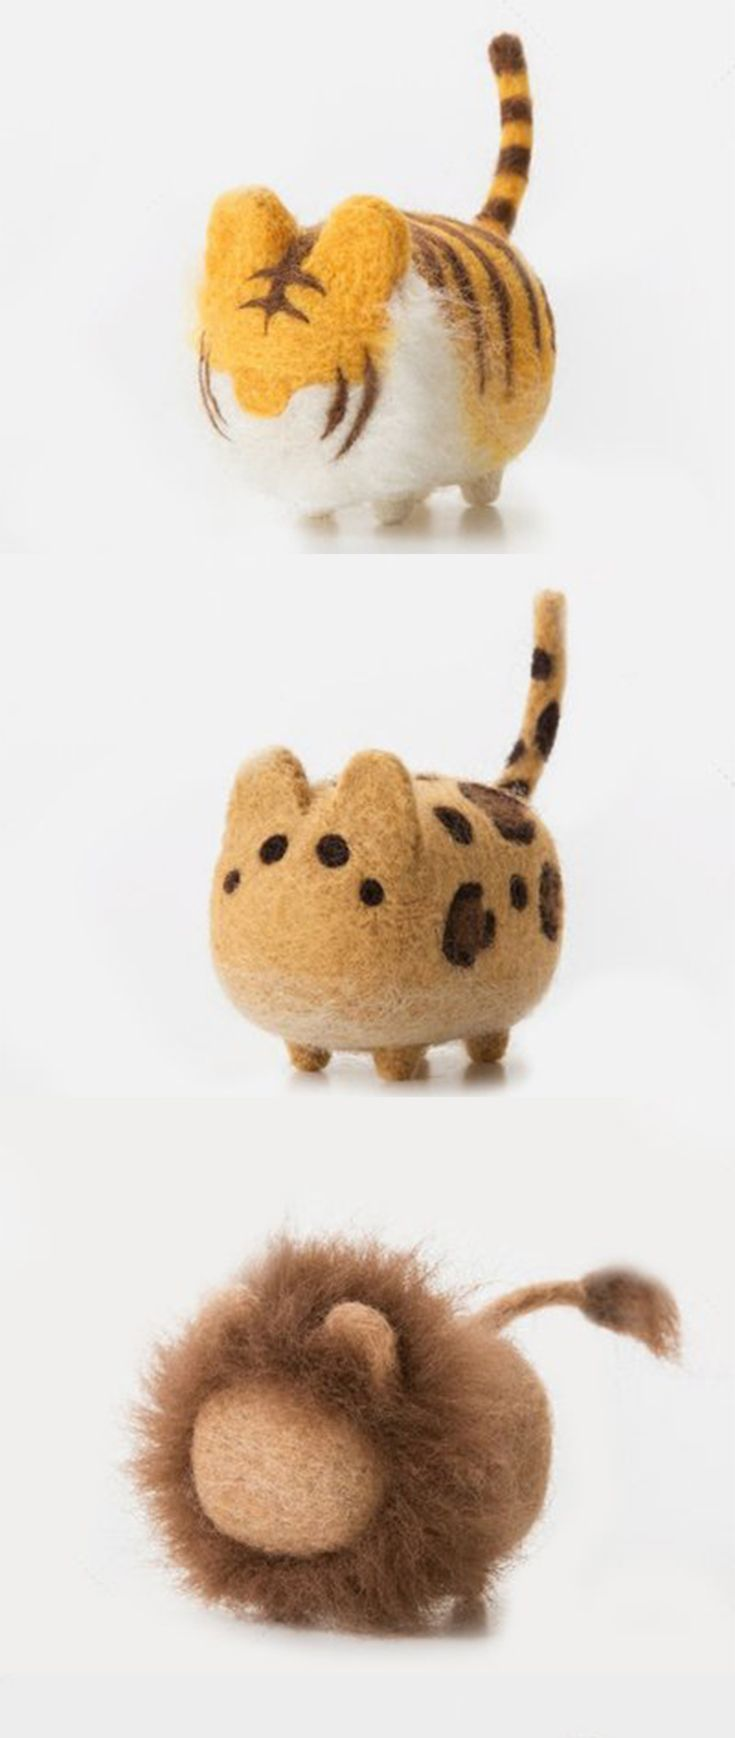 Felted Tiger Felted Leopard Felted Lion Diy Needle Felting Kit Needlecrafts Faceless Wild Cat Felted Animals N Needle Felting Kits Needle Felting Wool Cat